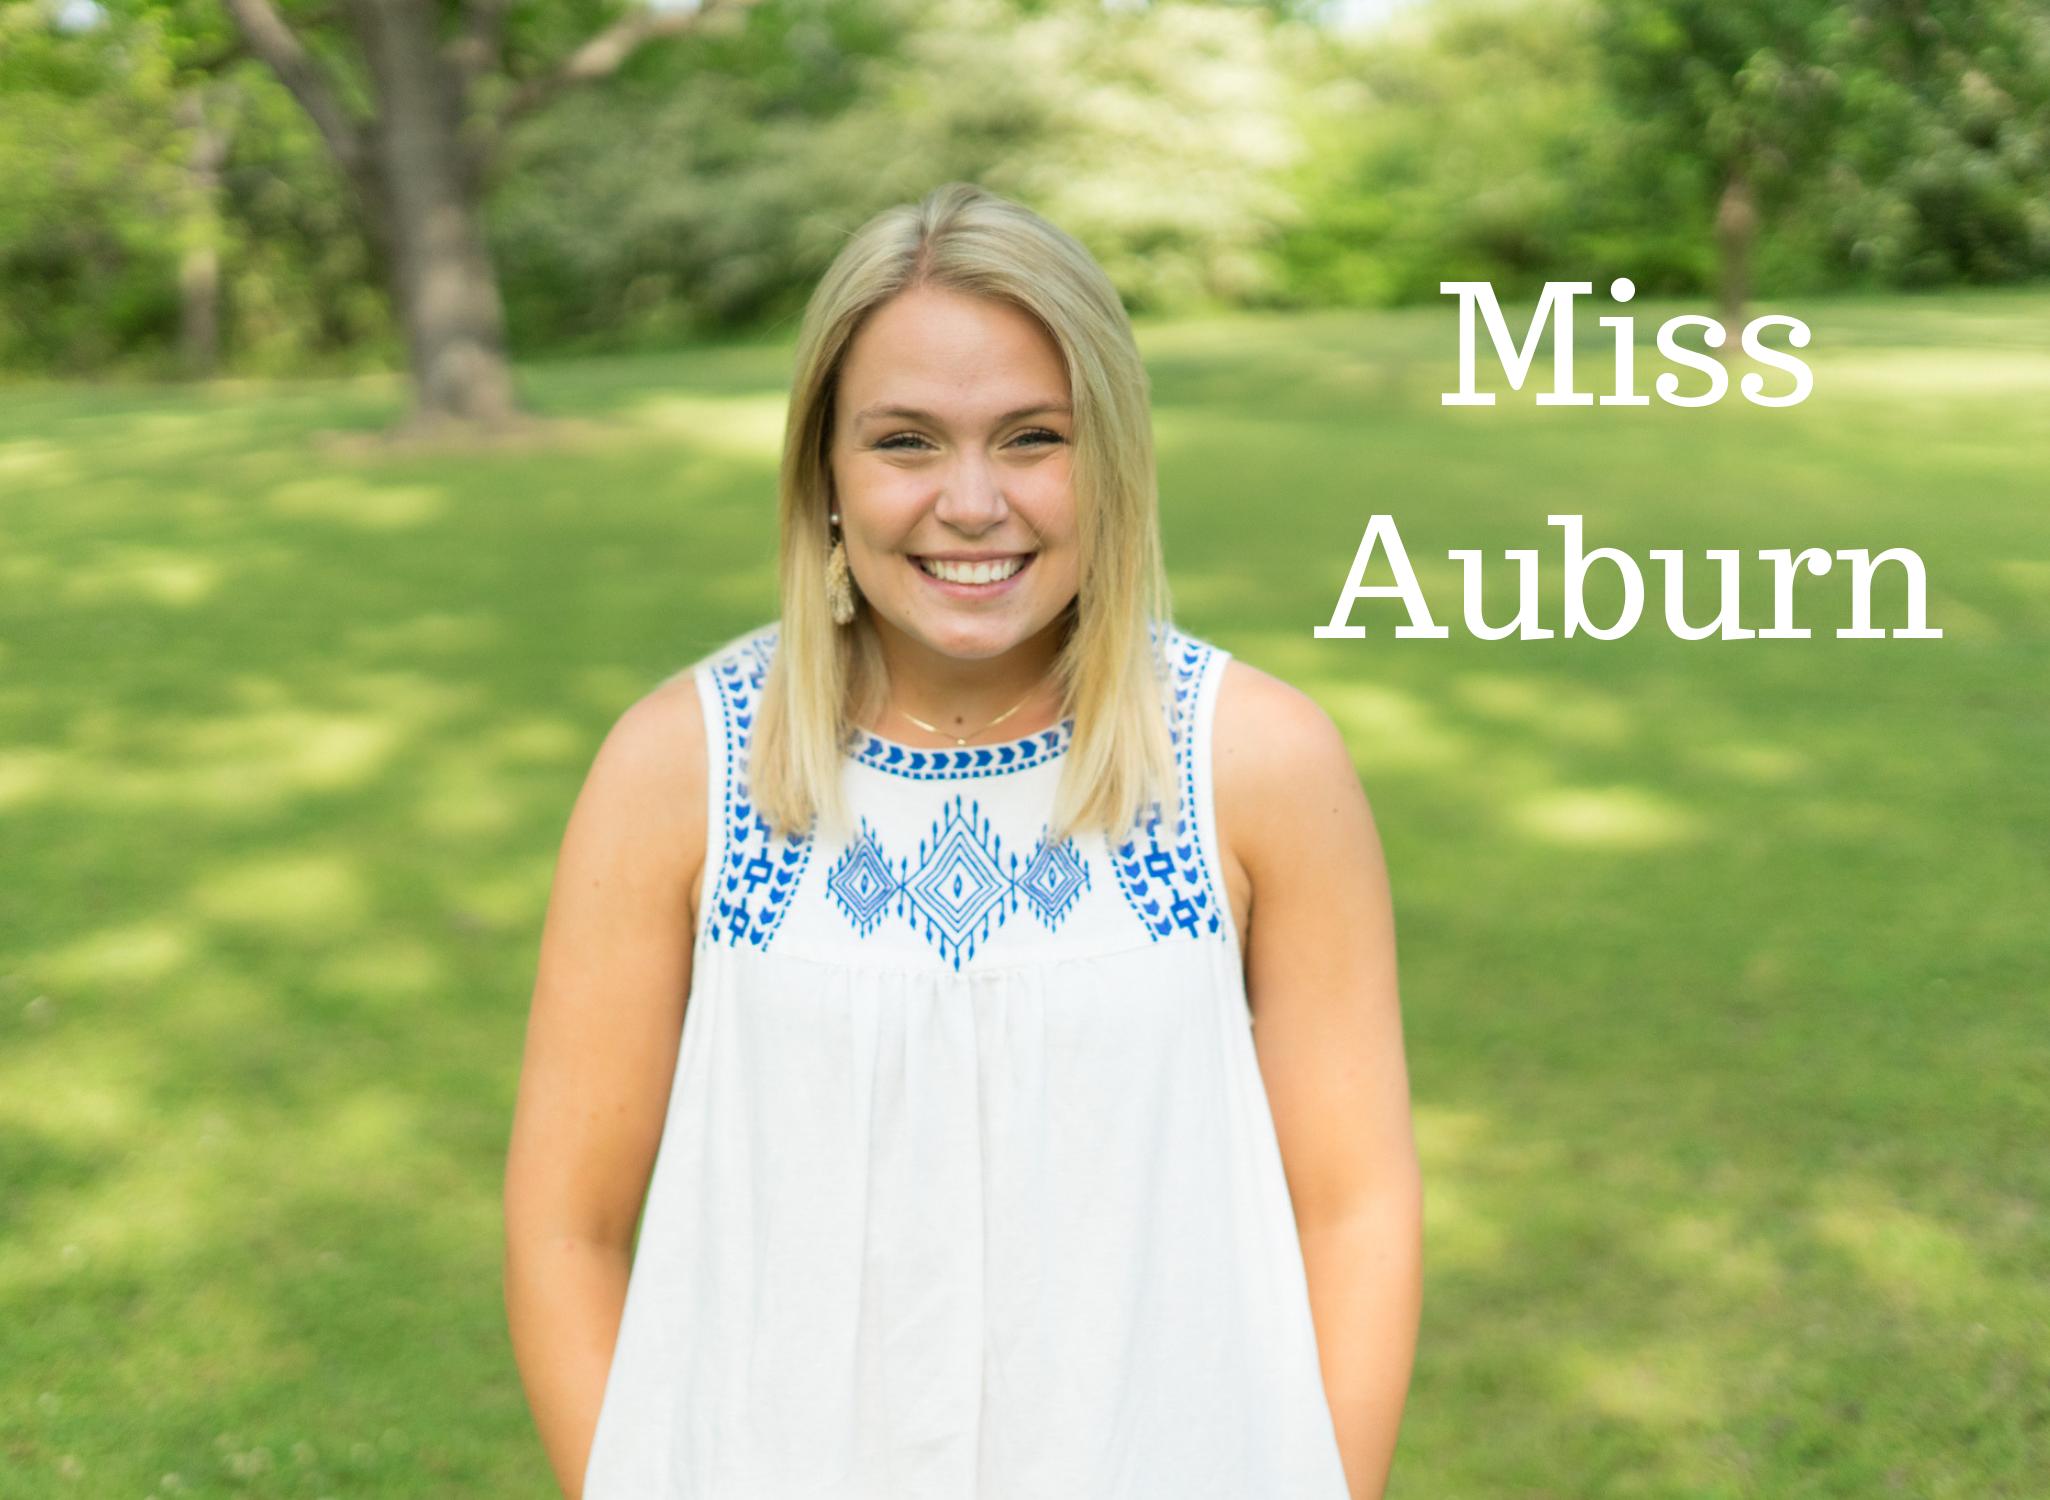 Miss Auburn.png